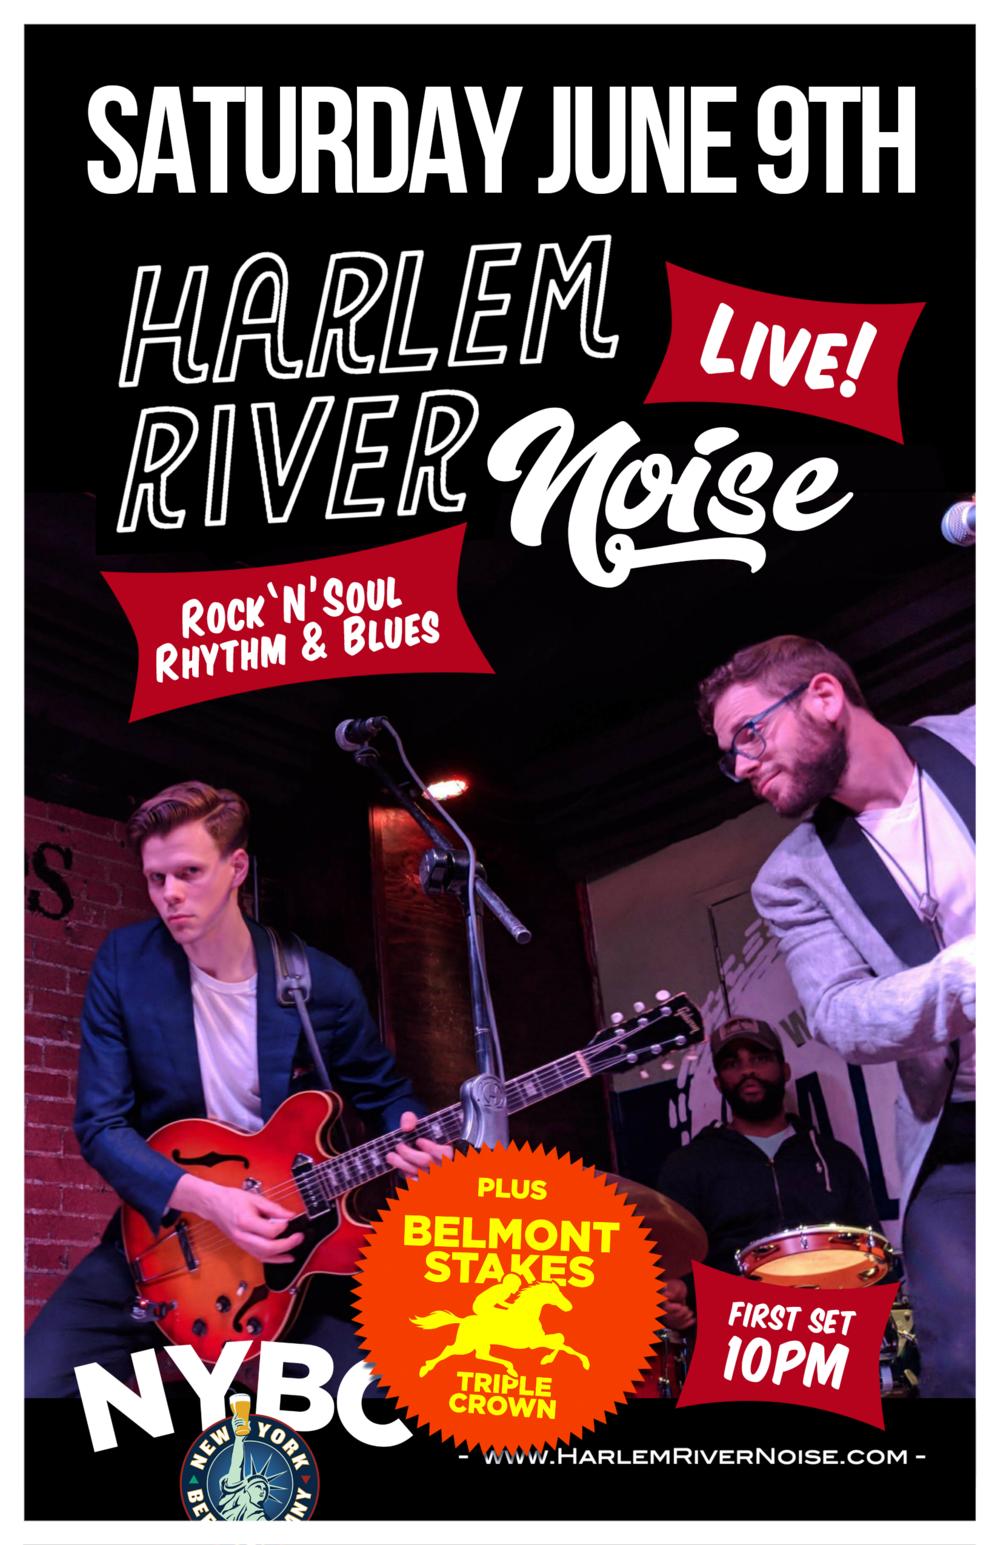 harlem river noise NYC